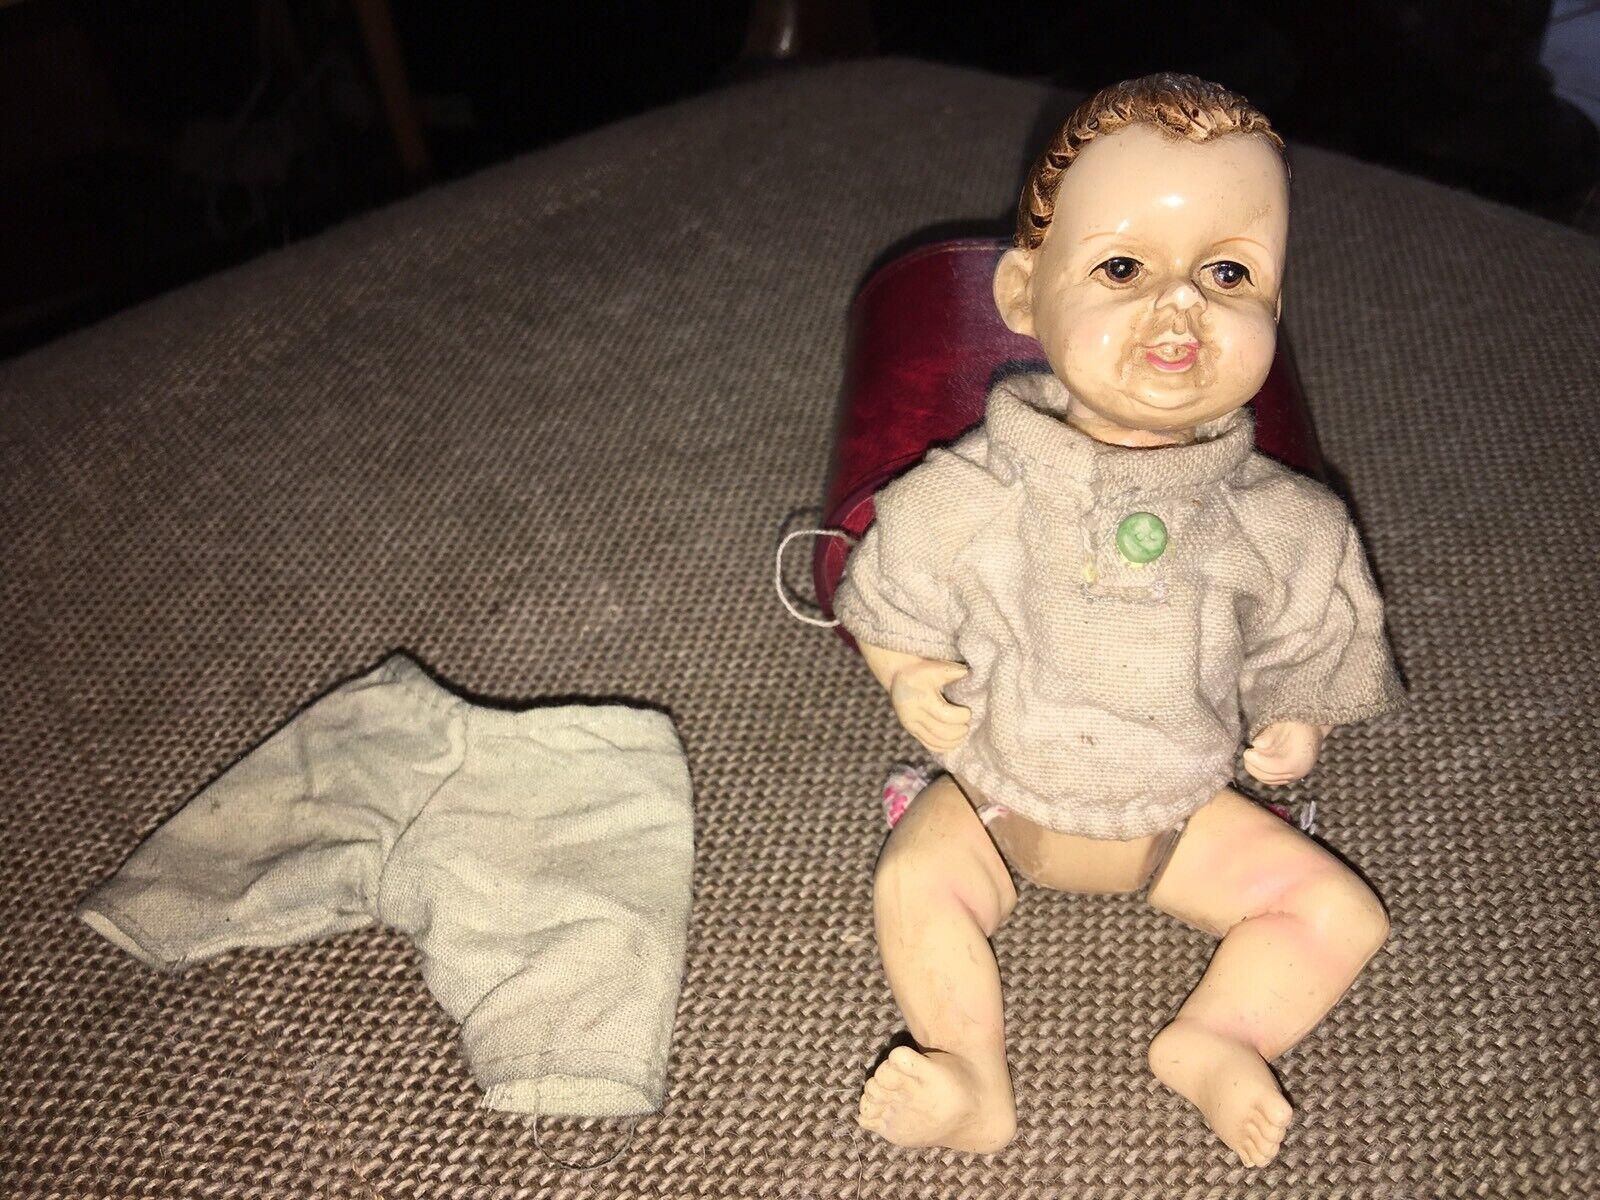 Petit Babypuppe Antik Antik Antik Gegliedert Porzellan Mehrfarbig f47f07